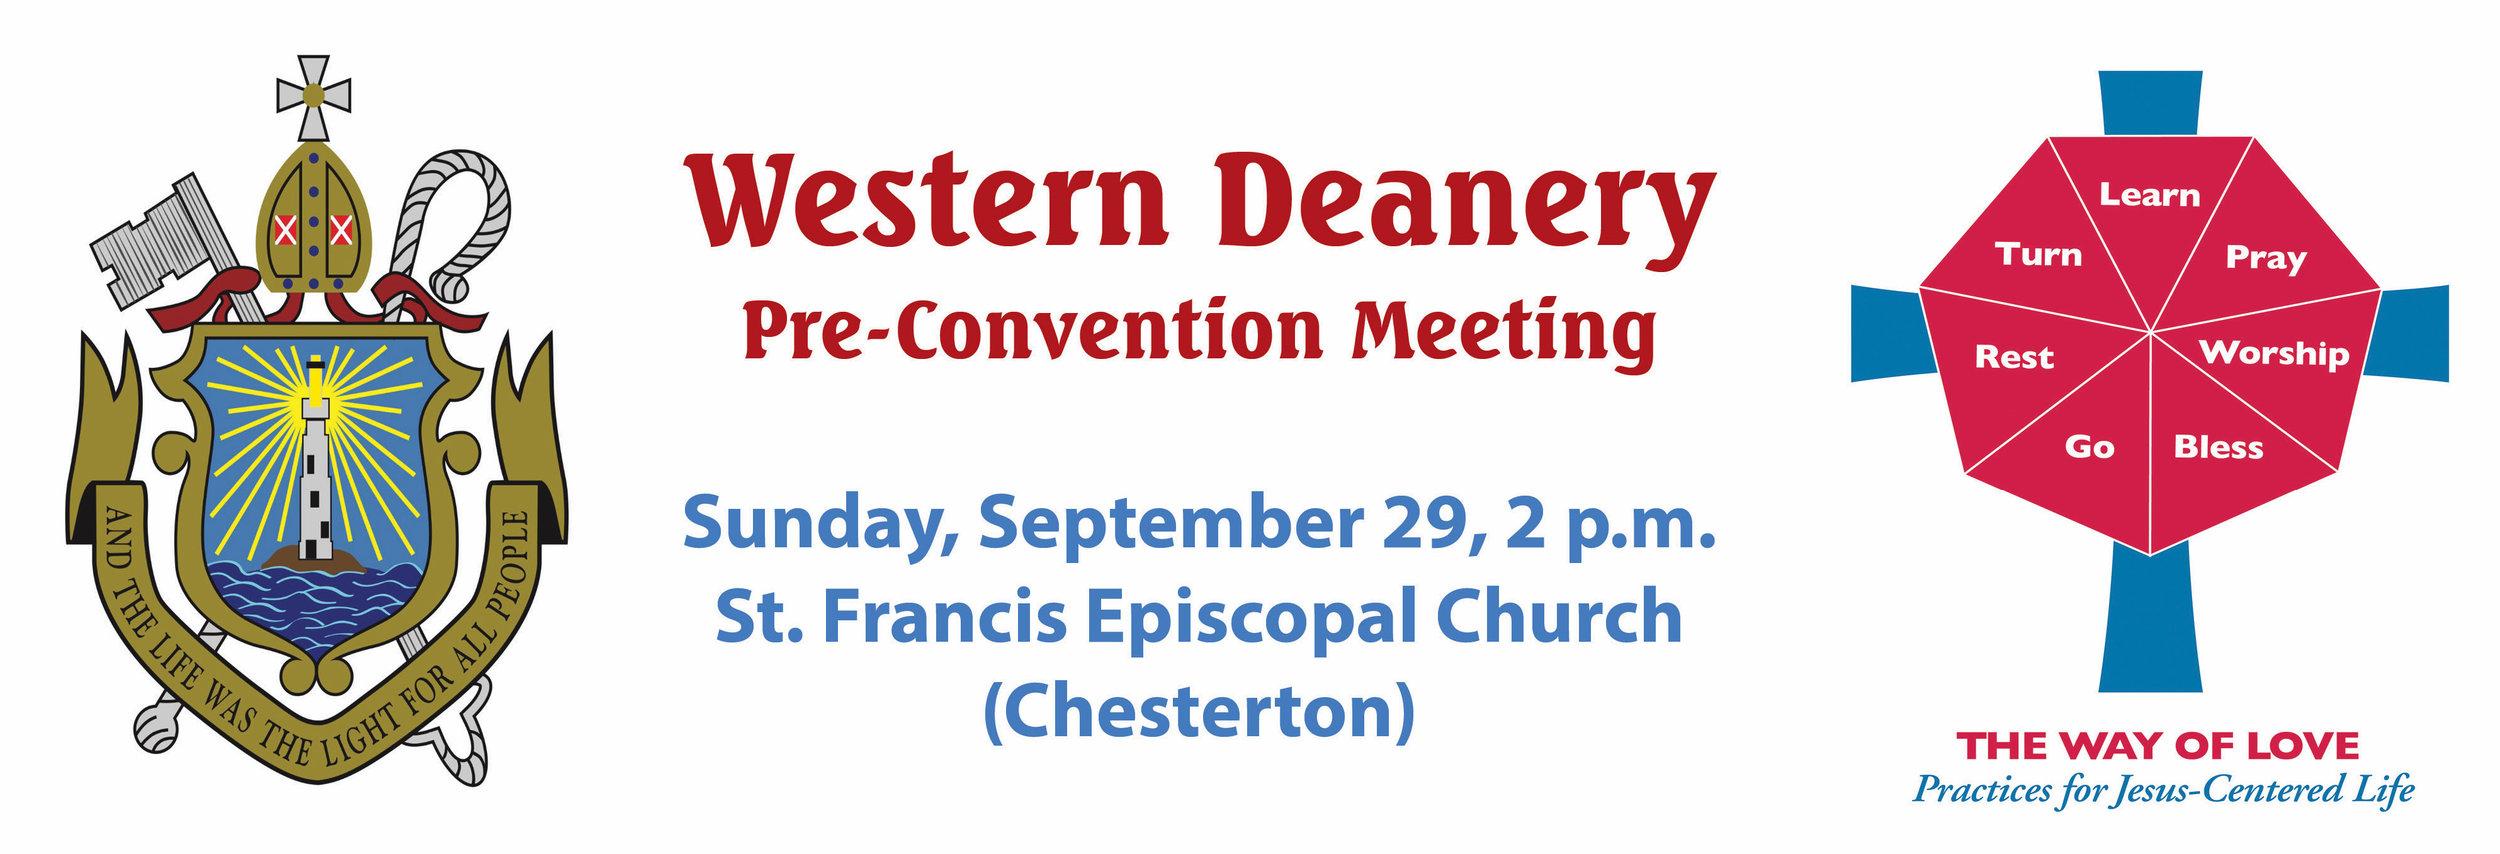 2019 Western Deanery DioCon Graphic.jpg